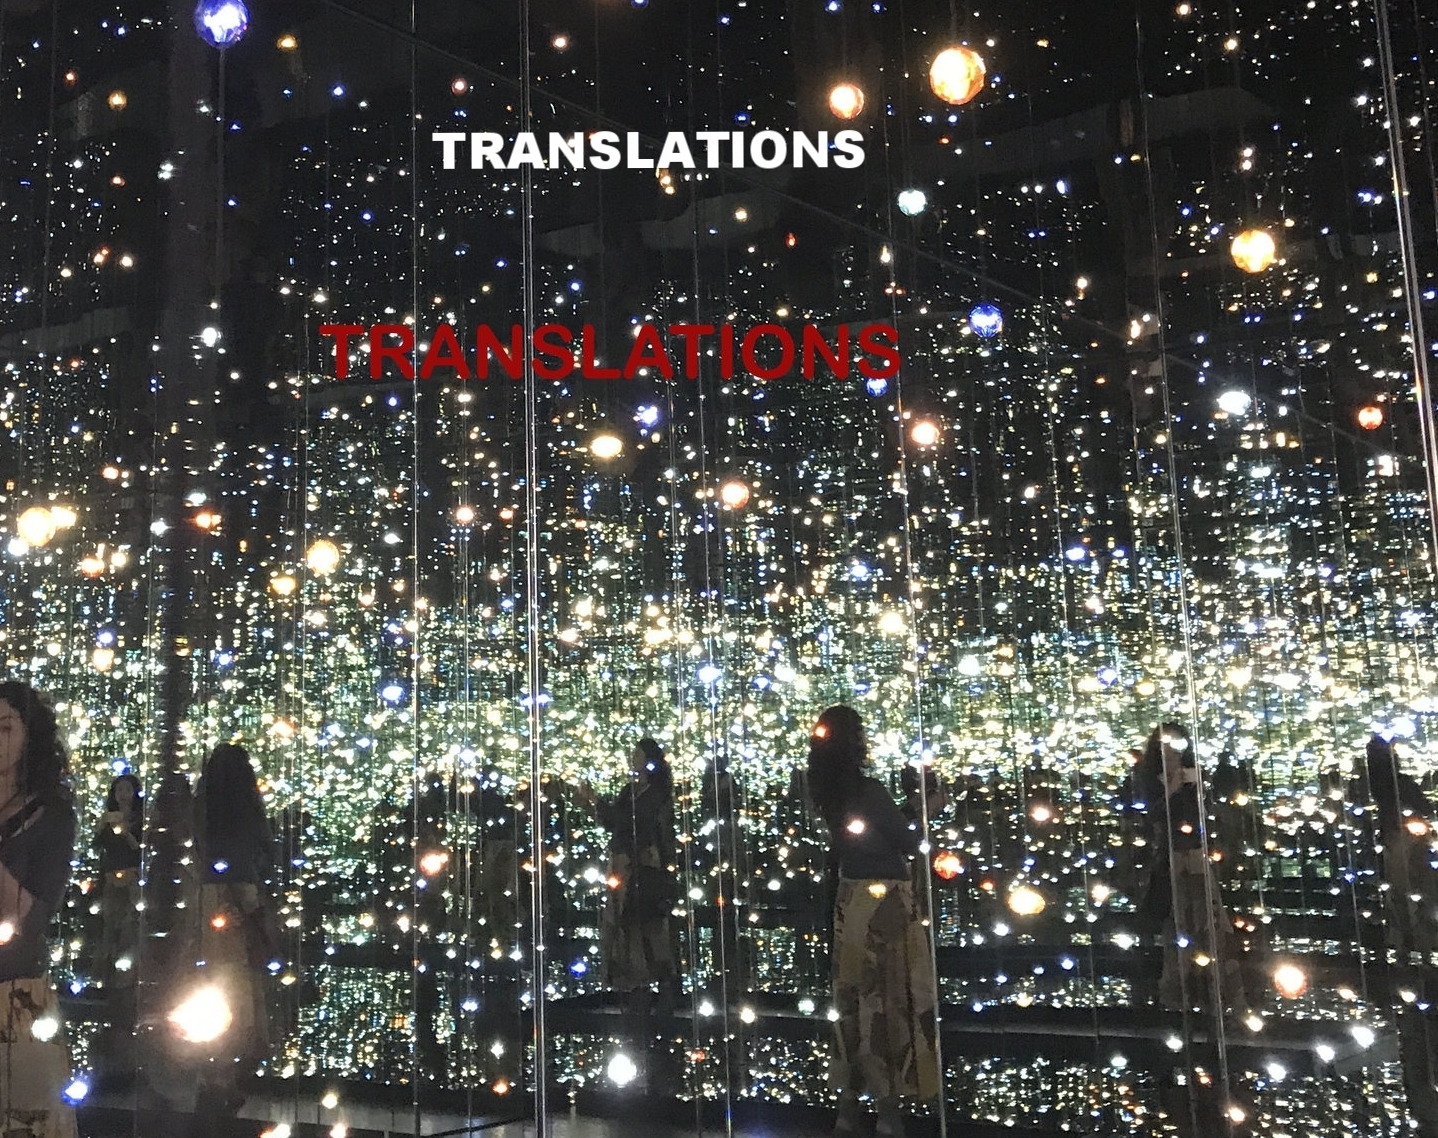 TRANSLATIONS-Sholeh Wolpe.jpg